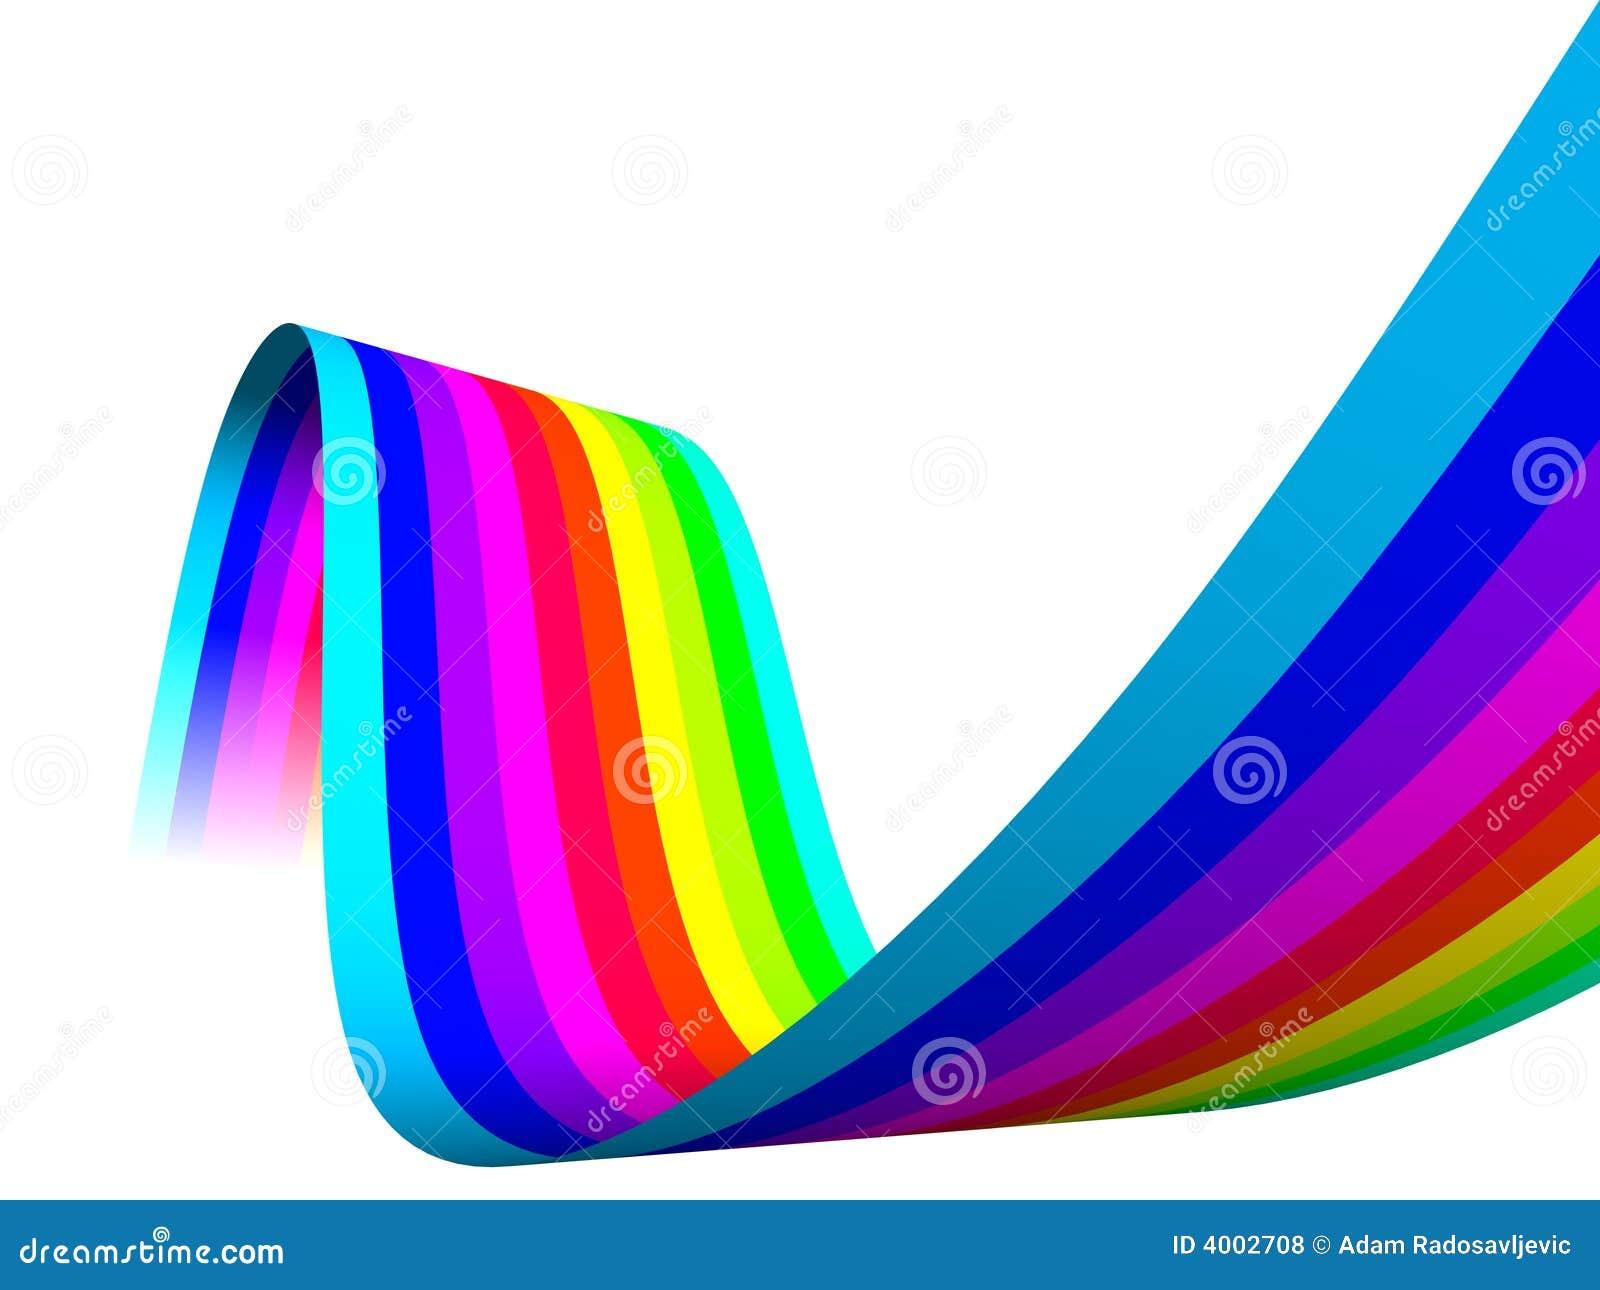 Arc en ciel multicolore photos libres de droits image - Image arc en ciel gratuite ...